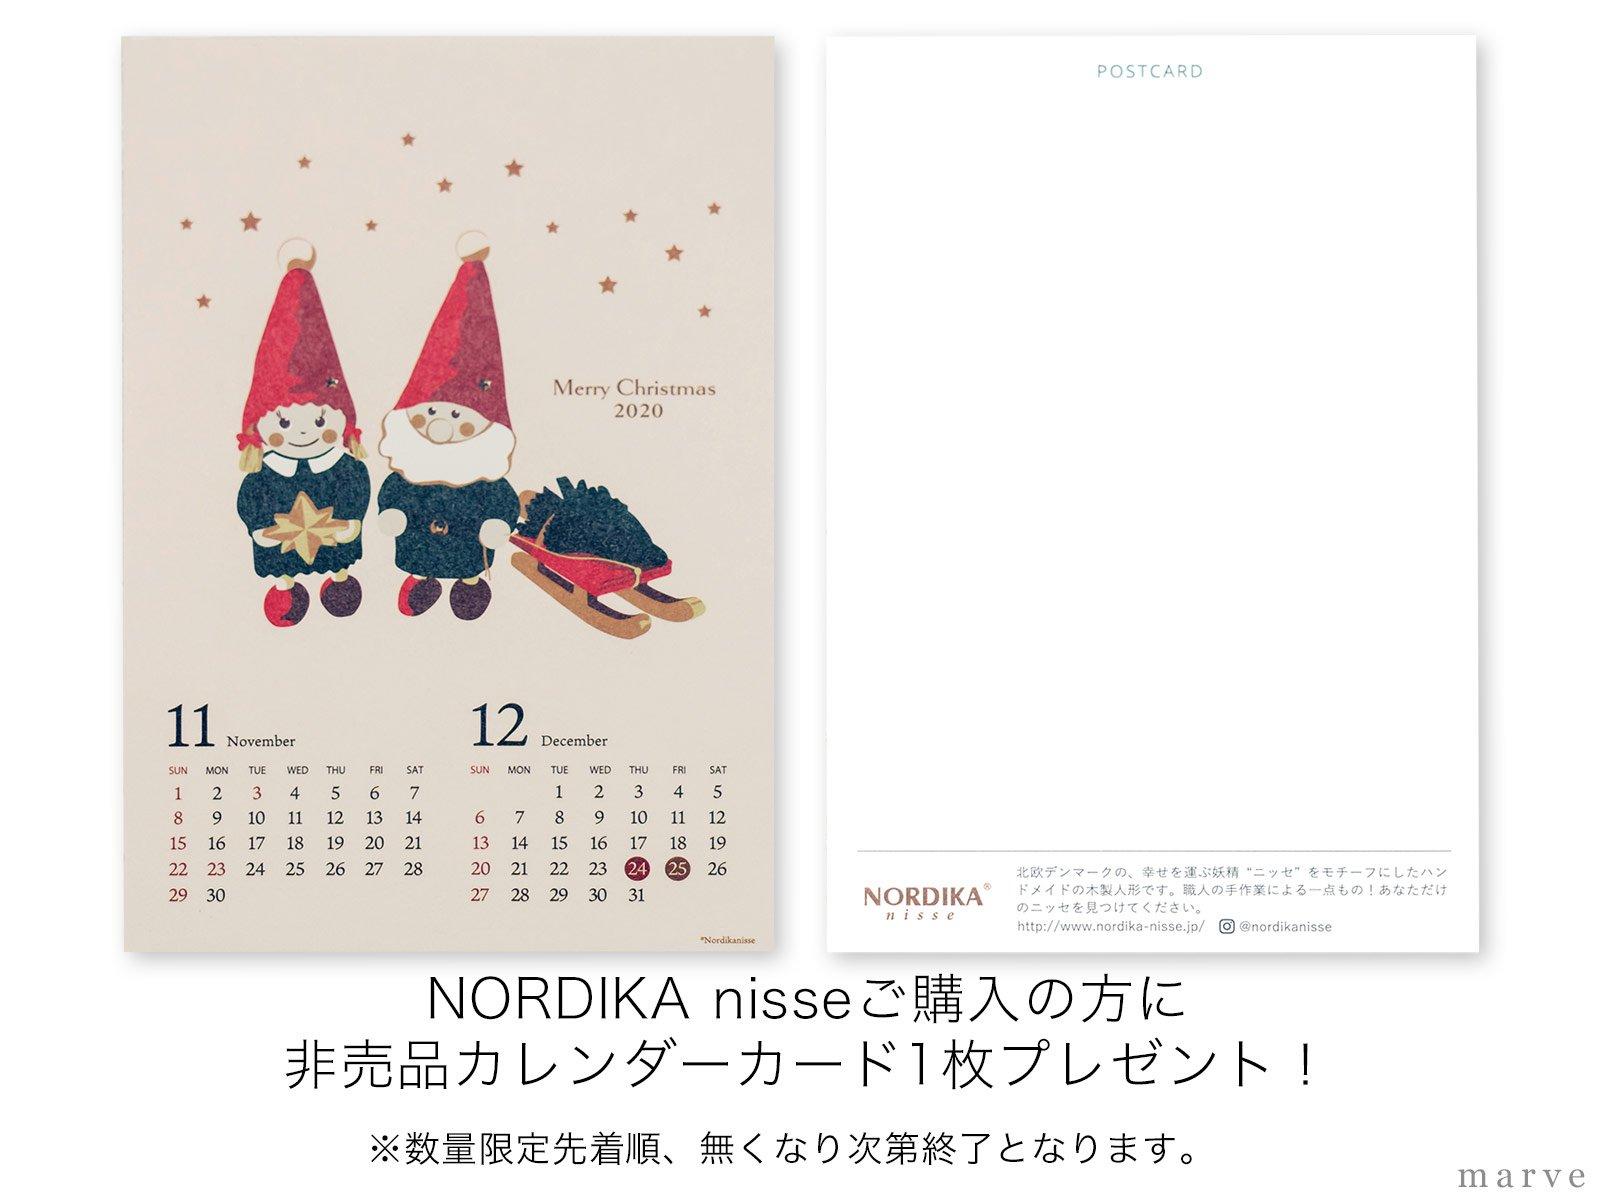 NORDIKA design ニッセドール 「電飾にからまるサンタ(赤) フェルト」<img class='new_mark_img2' src='https://img.shop-pro.jp/img/new/icons1.gif' style='border:none;display:inline;margin:0px;padding:0px;width:auto;' />